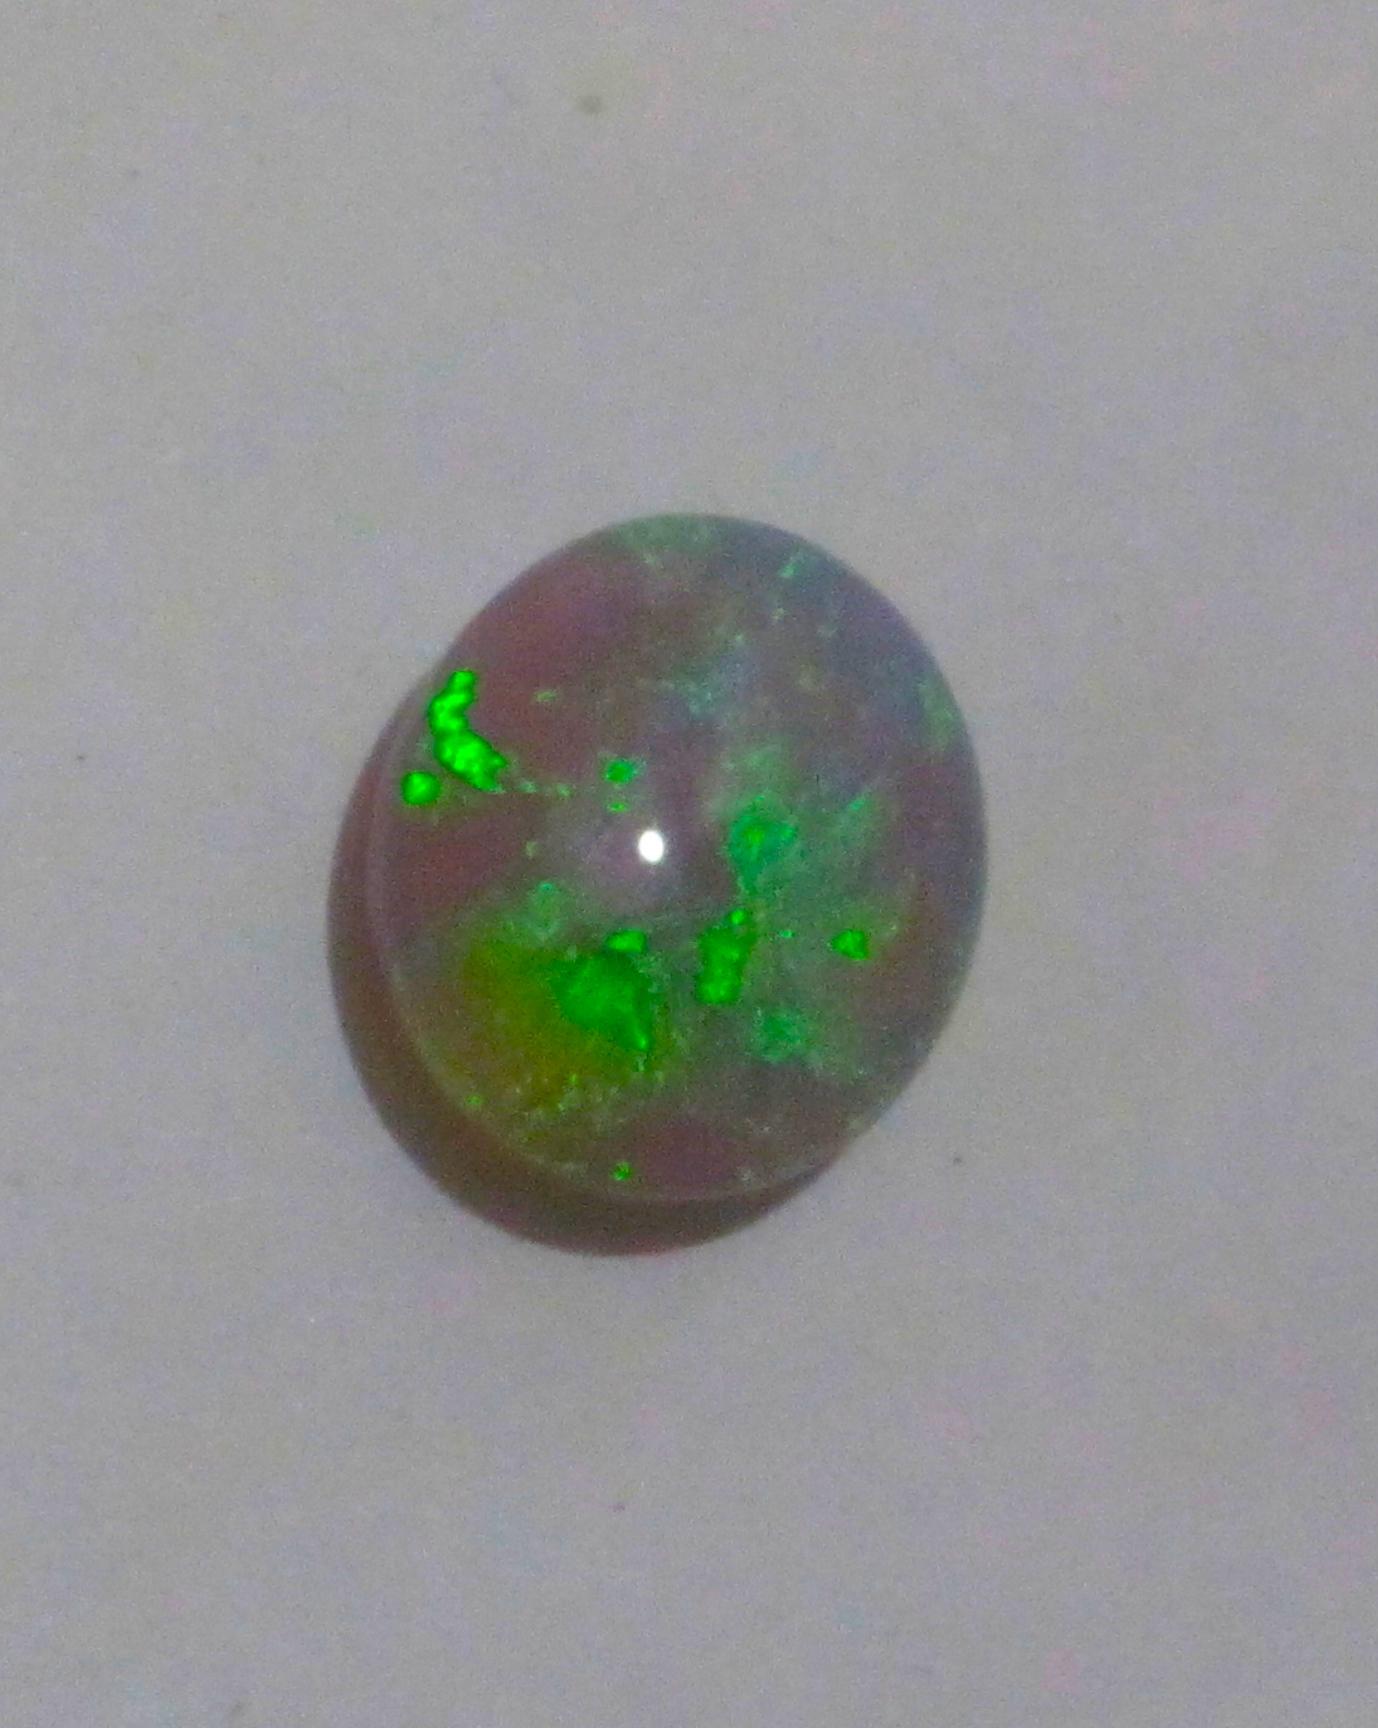 opals for sale,opal crystal for sale,opal gemstones